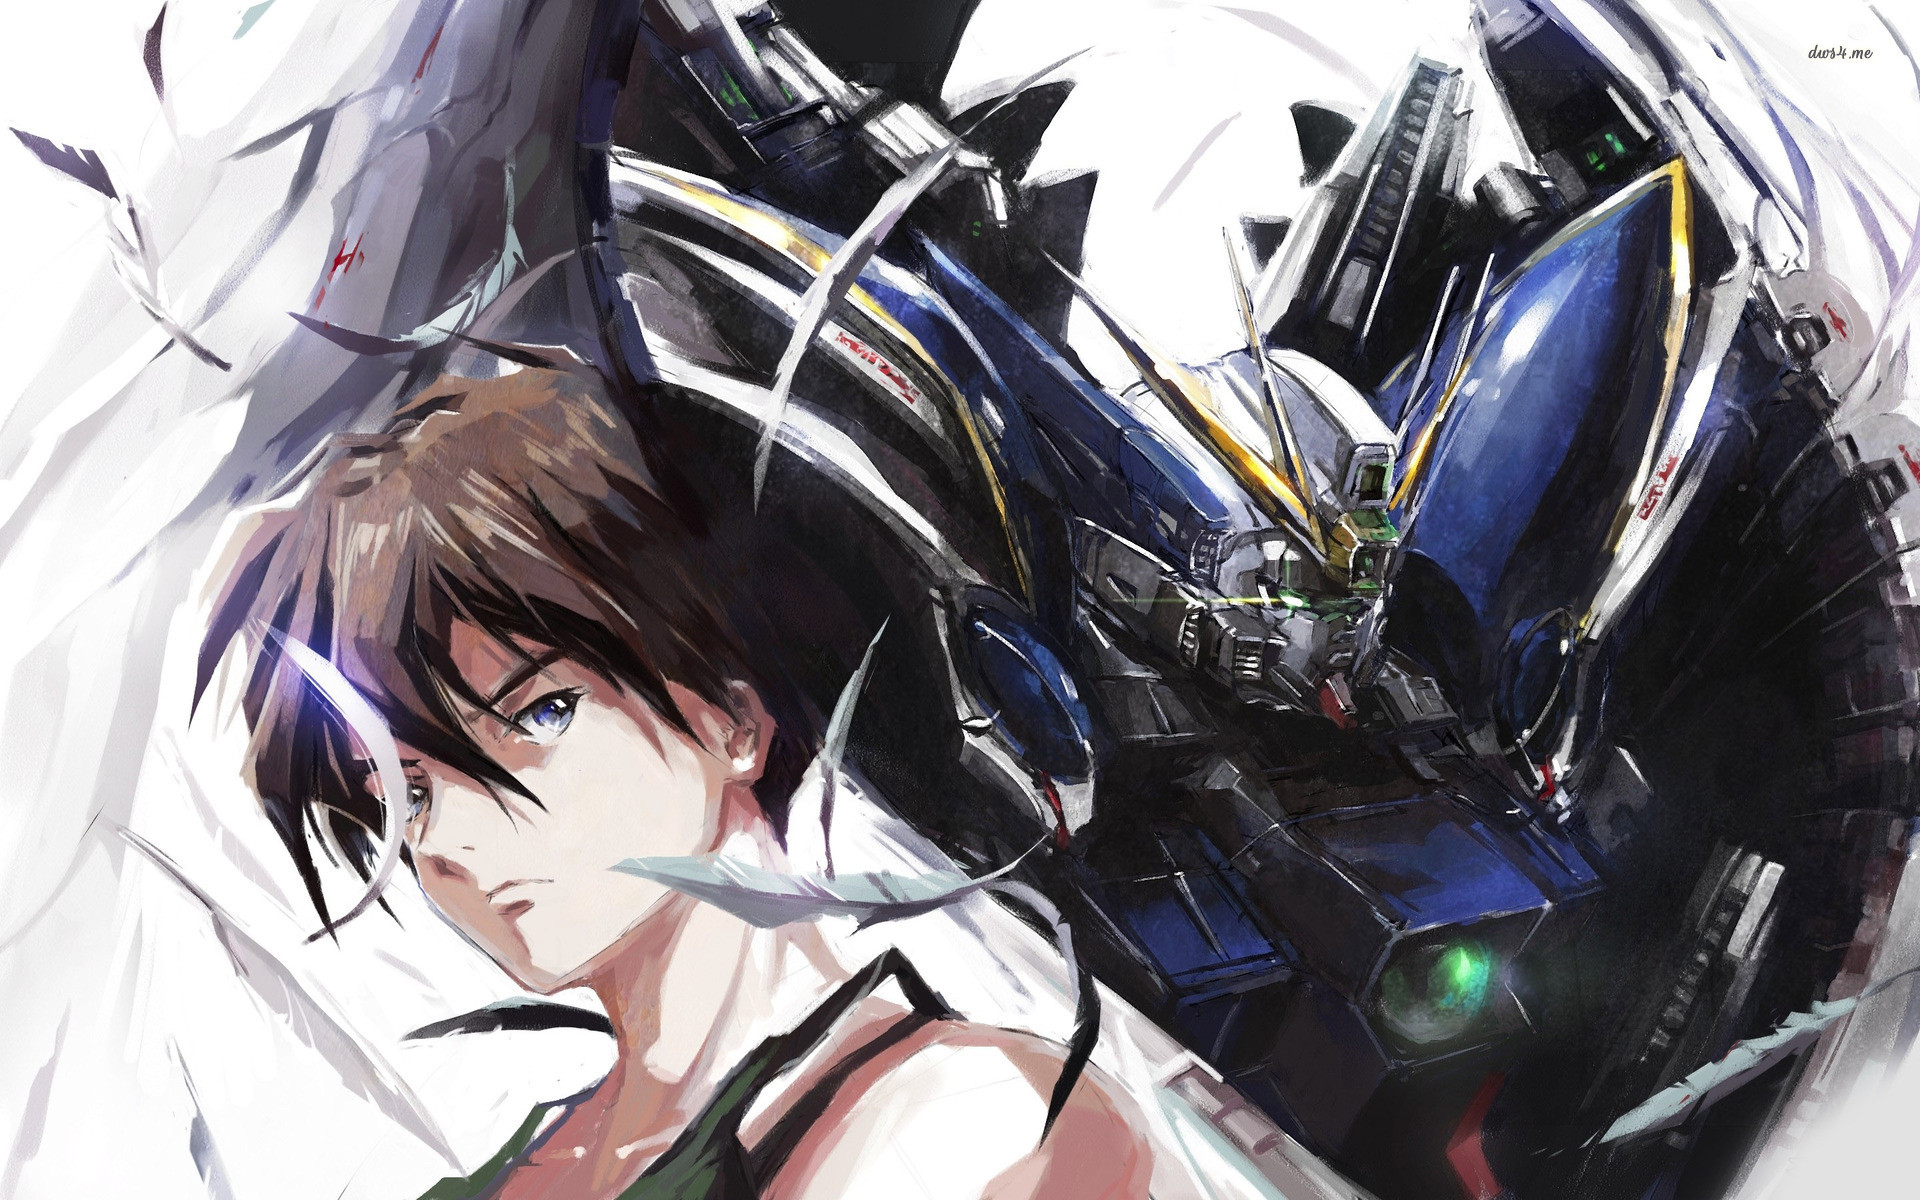 gundam-anime-wallpaper-8